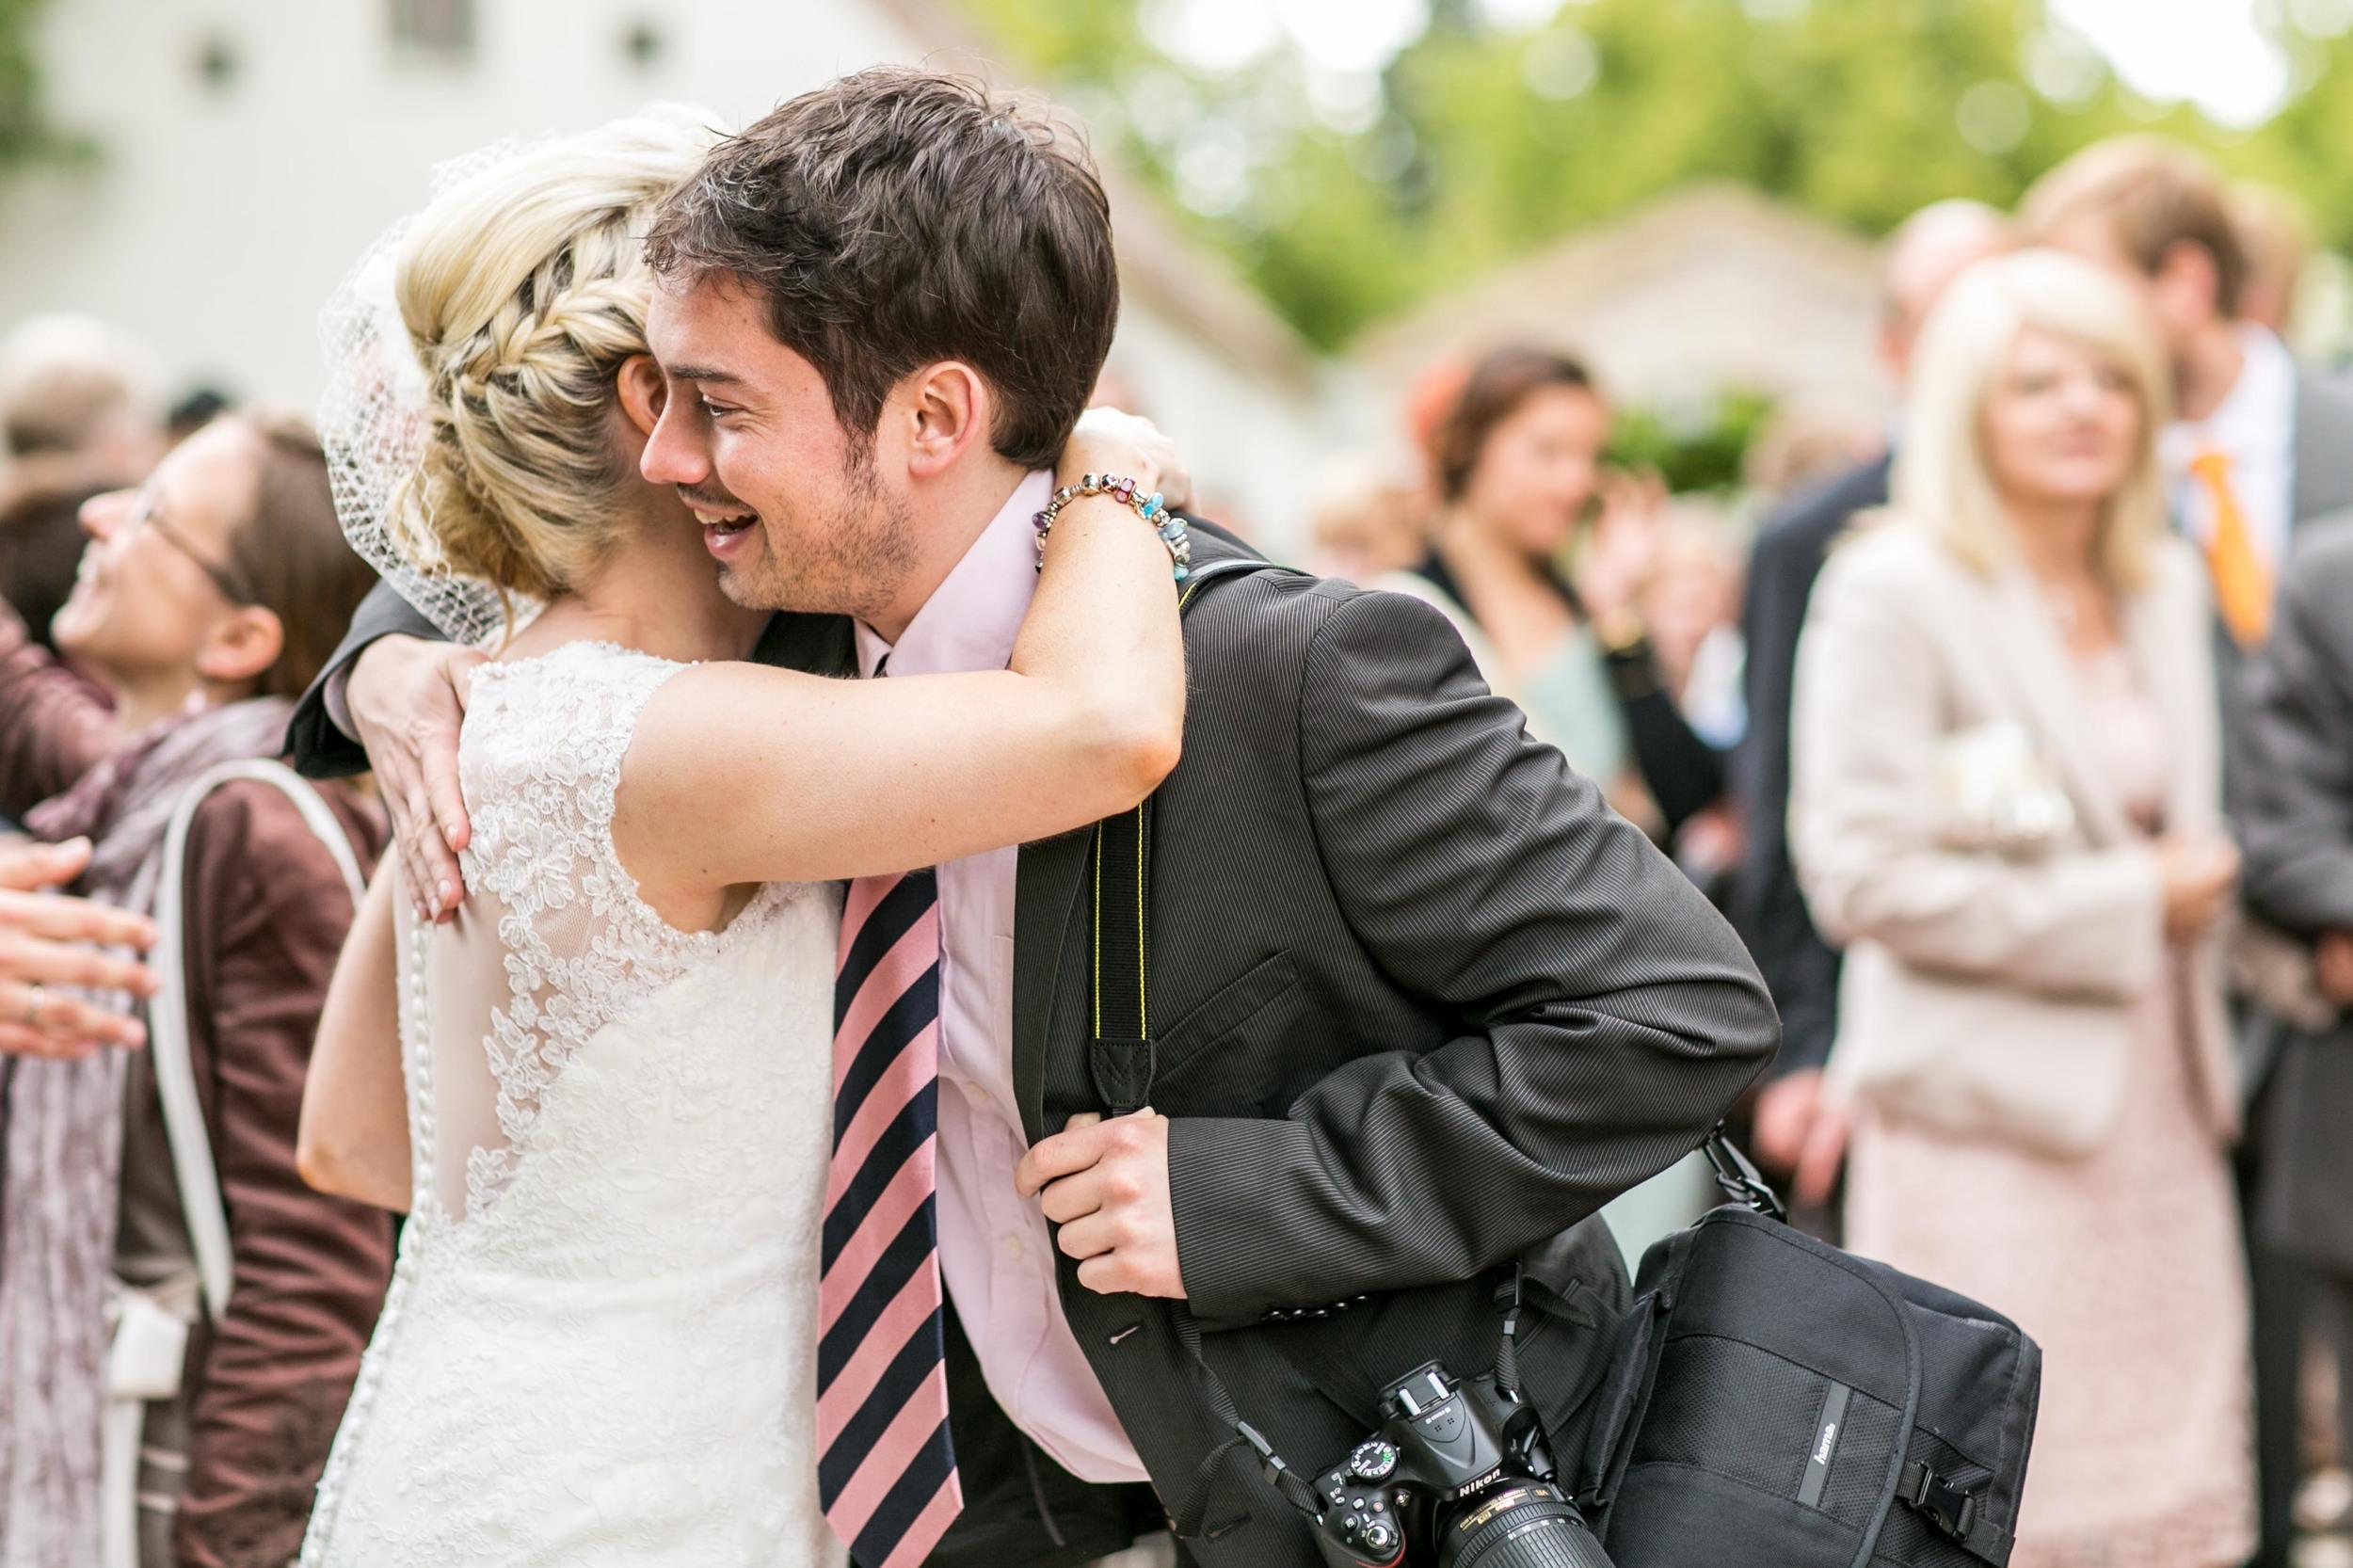 Hochzeitsfotografie Berlin_Fran Burrows Fotografie_21.jpg